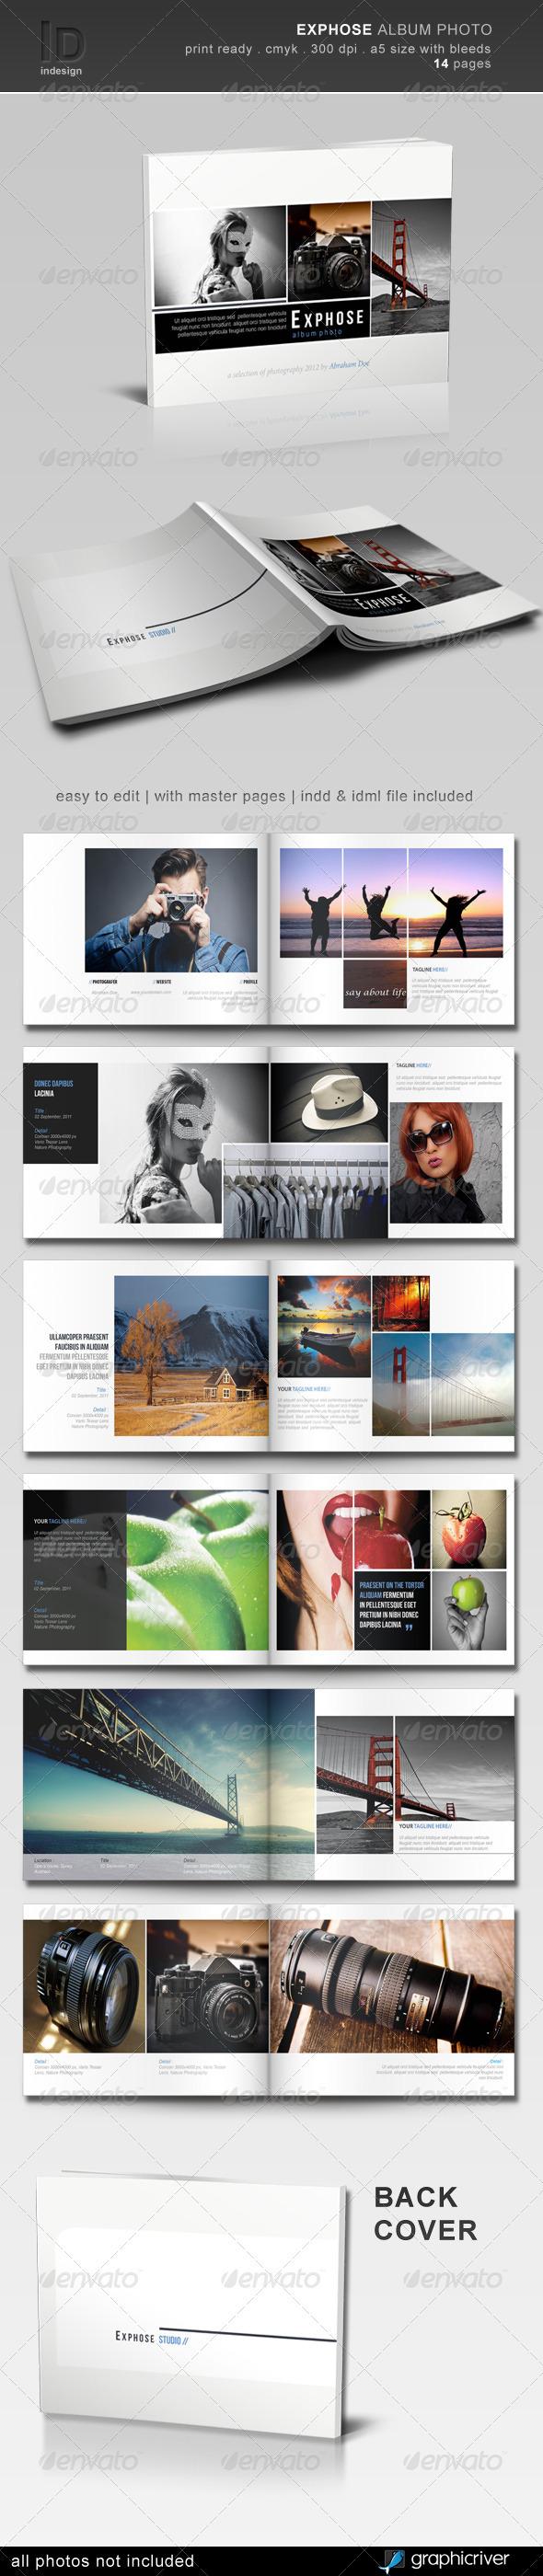 Exphose Album Photo - Photo Albums Print Templates